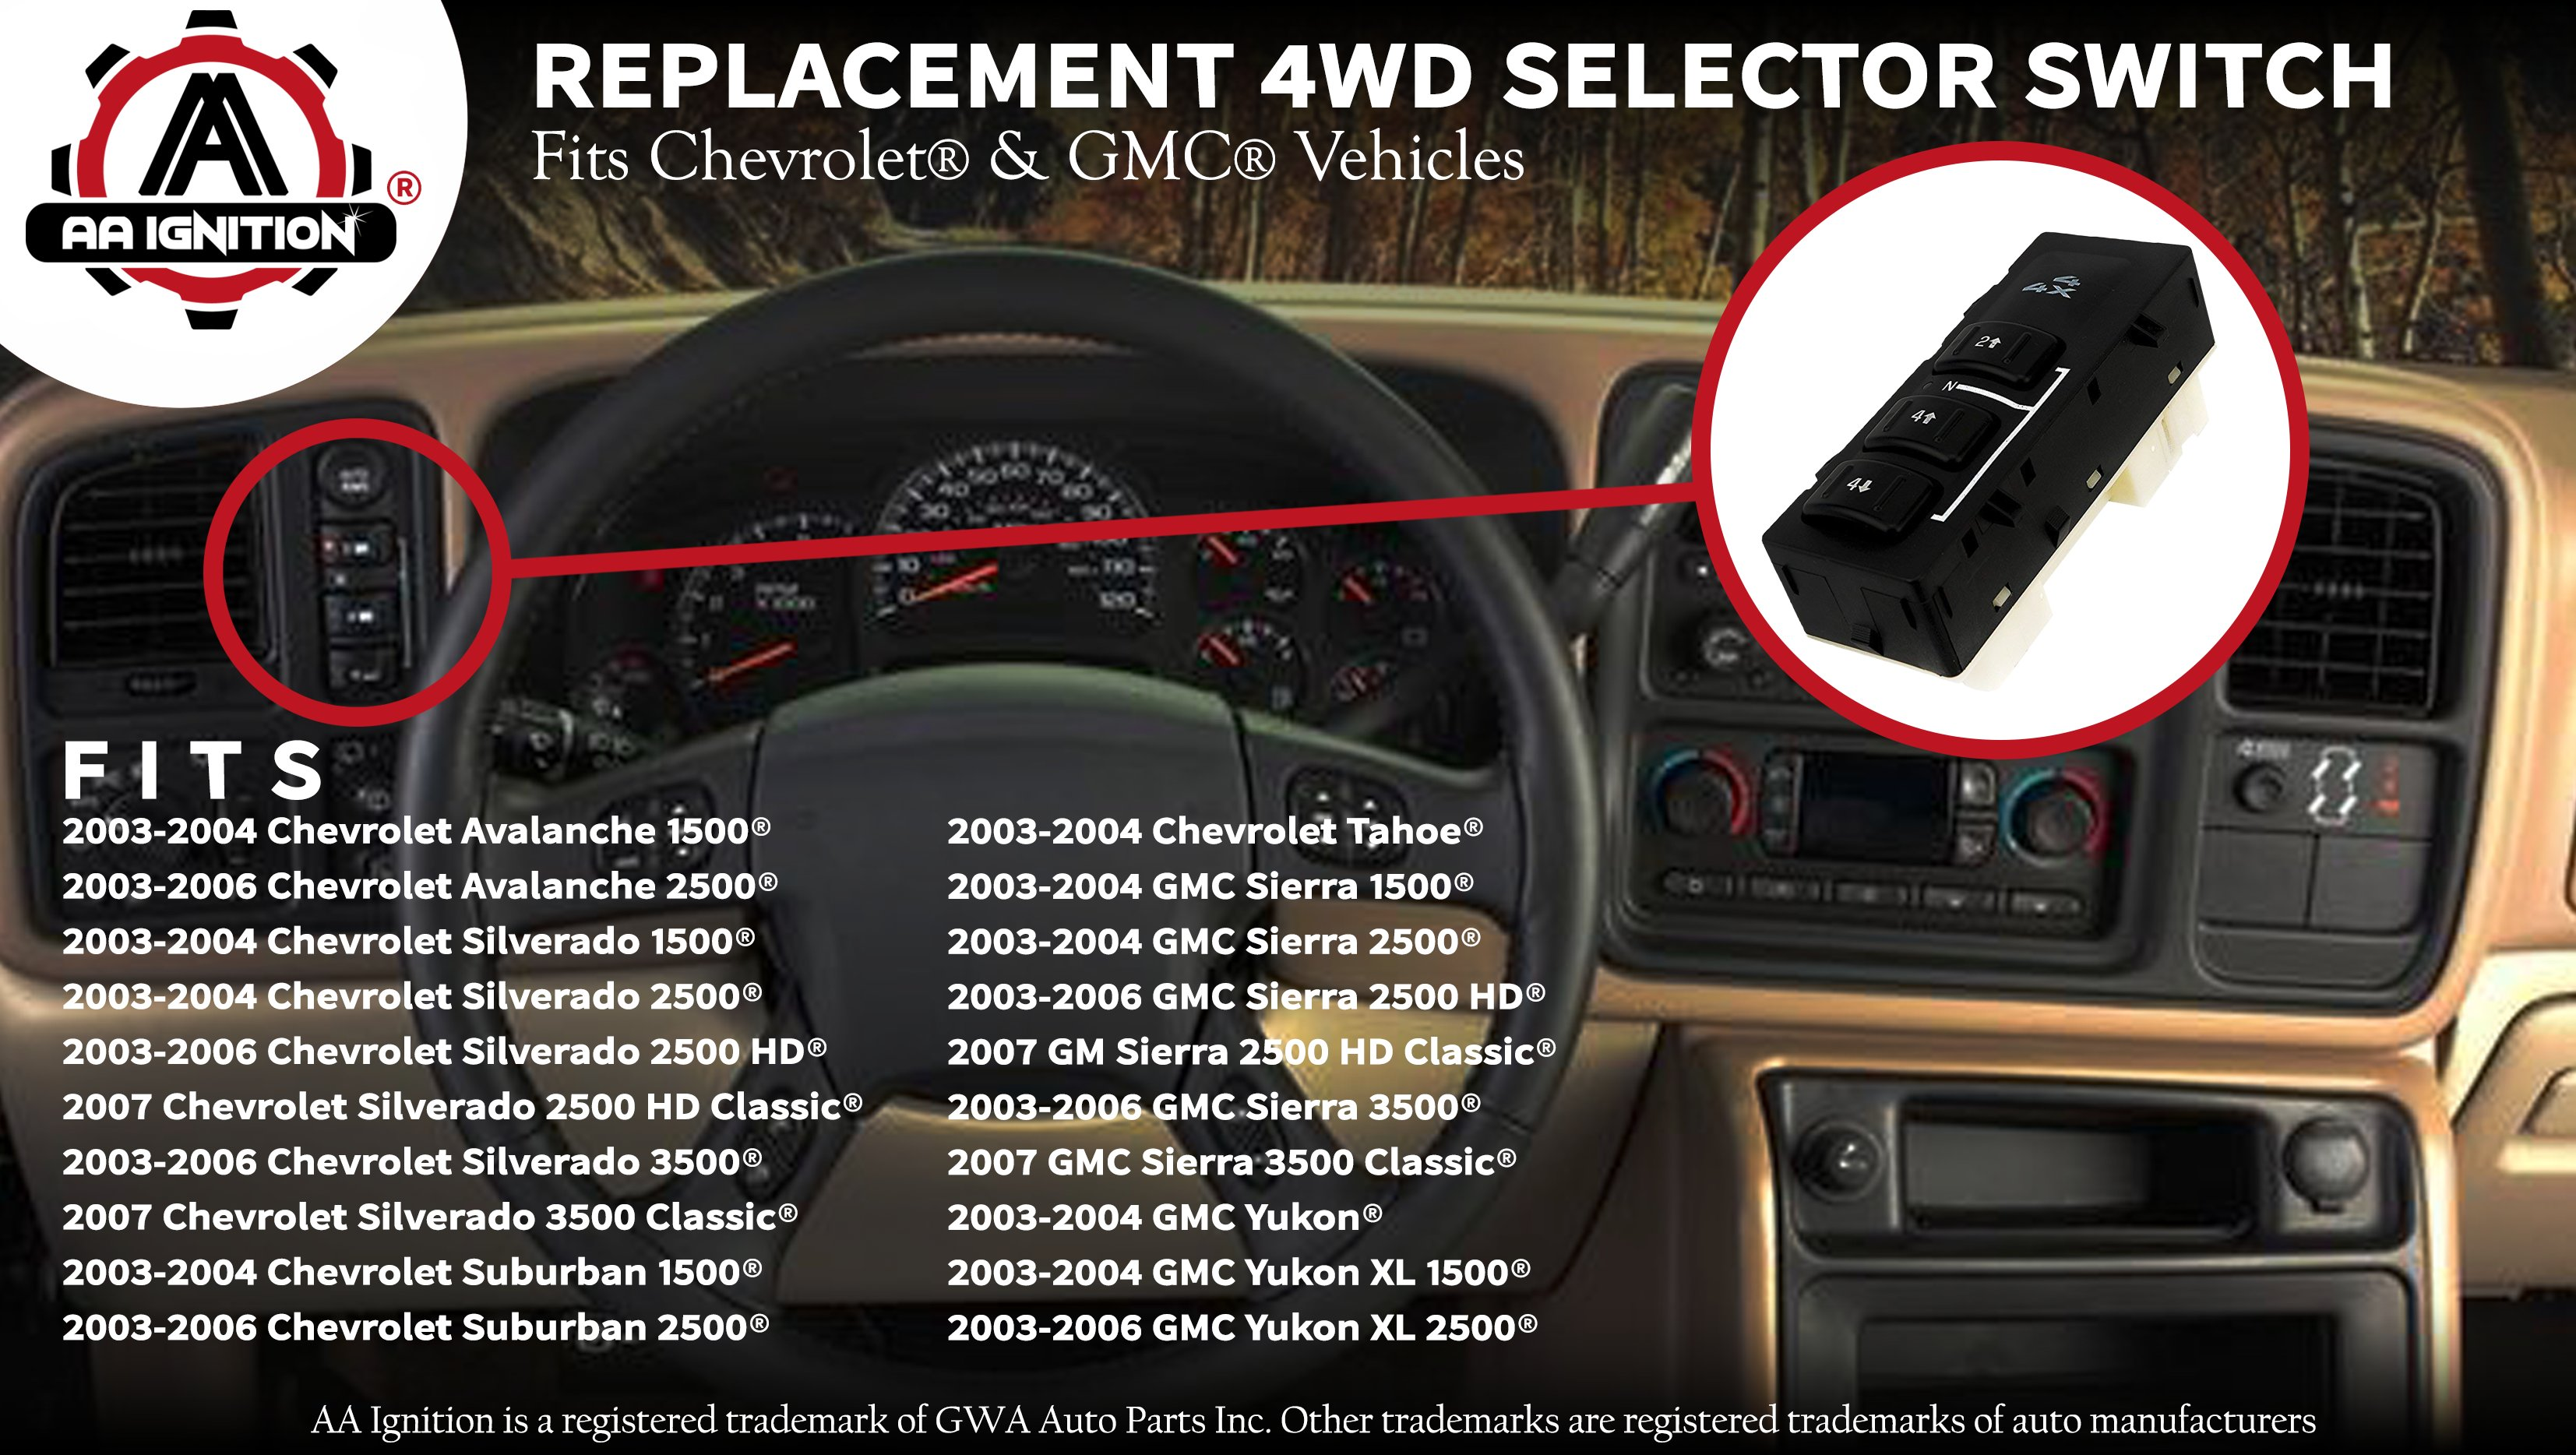 4WD Selector Switch, 4x4 Switch - Chevy Silverado, Suburban, Avalanche, GMC  Yukon, XL, Sierra 2003 - 2007 - Replaces# 19259312, 15164519, 15136040 - 4